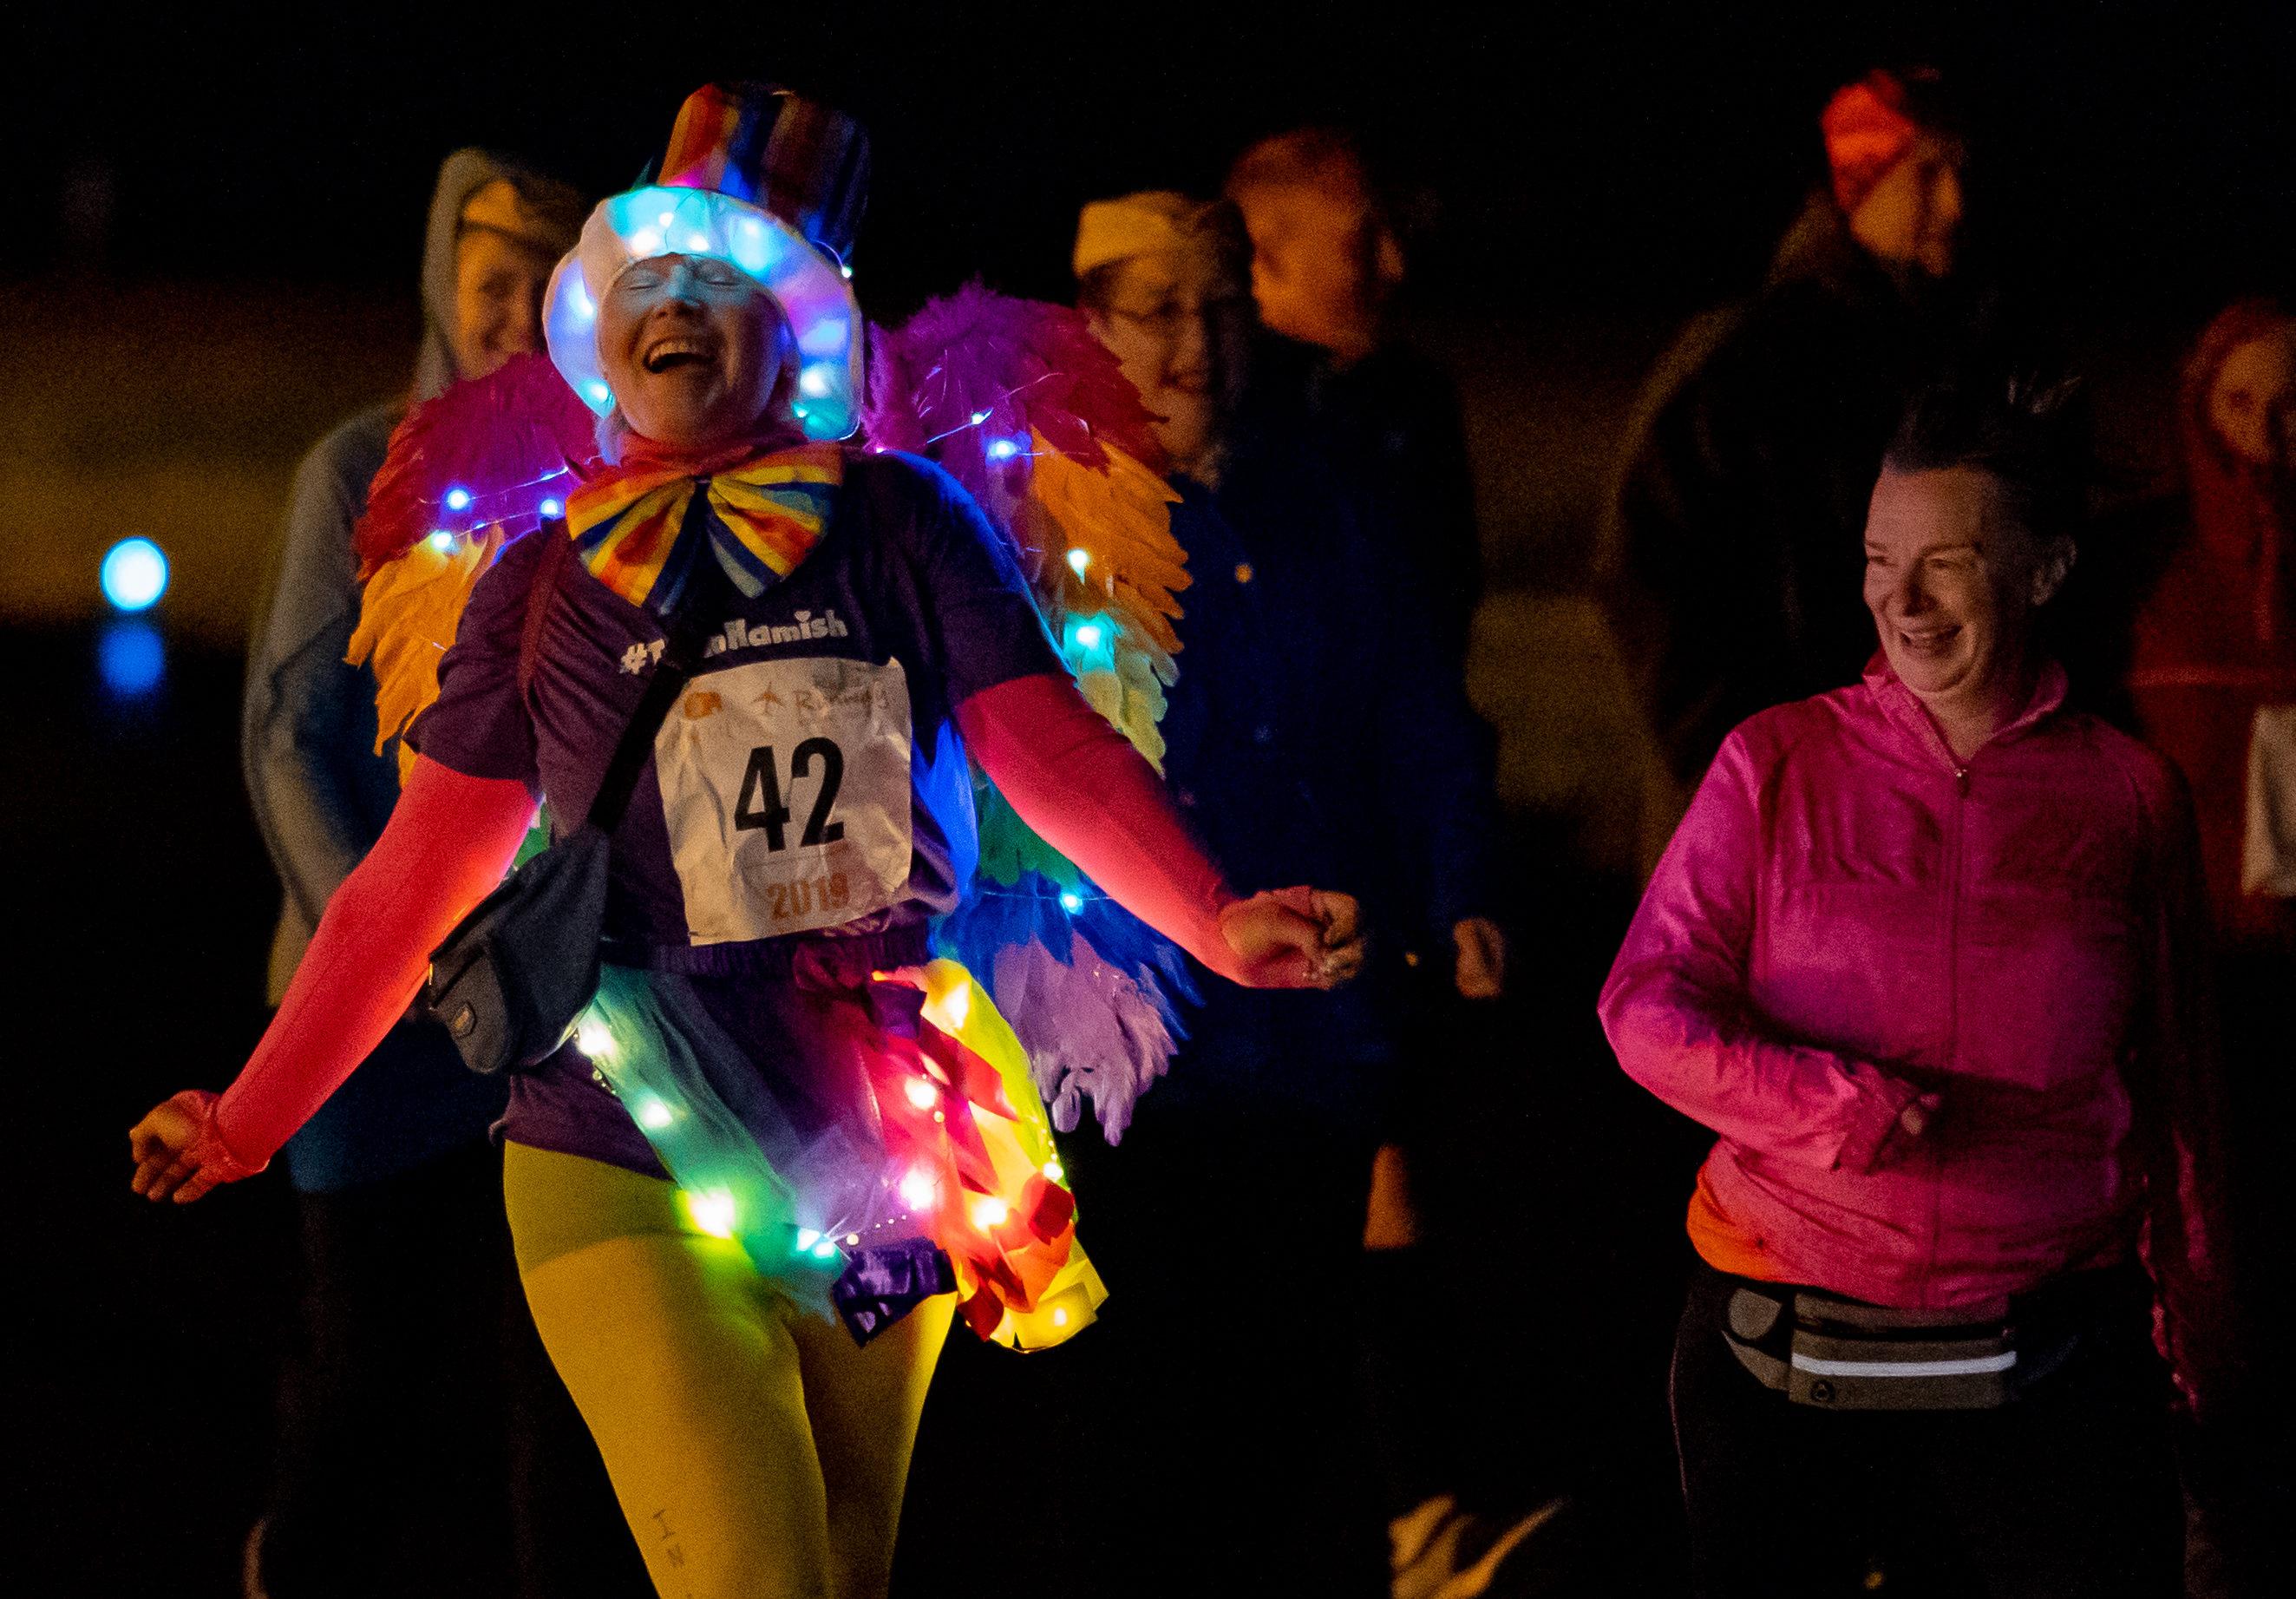 Amanda Galletch illuminates all around her at Run the Runway event.